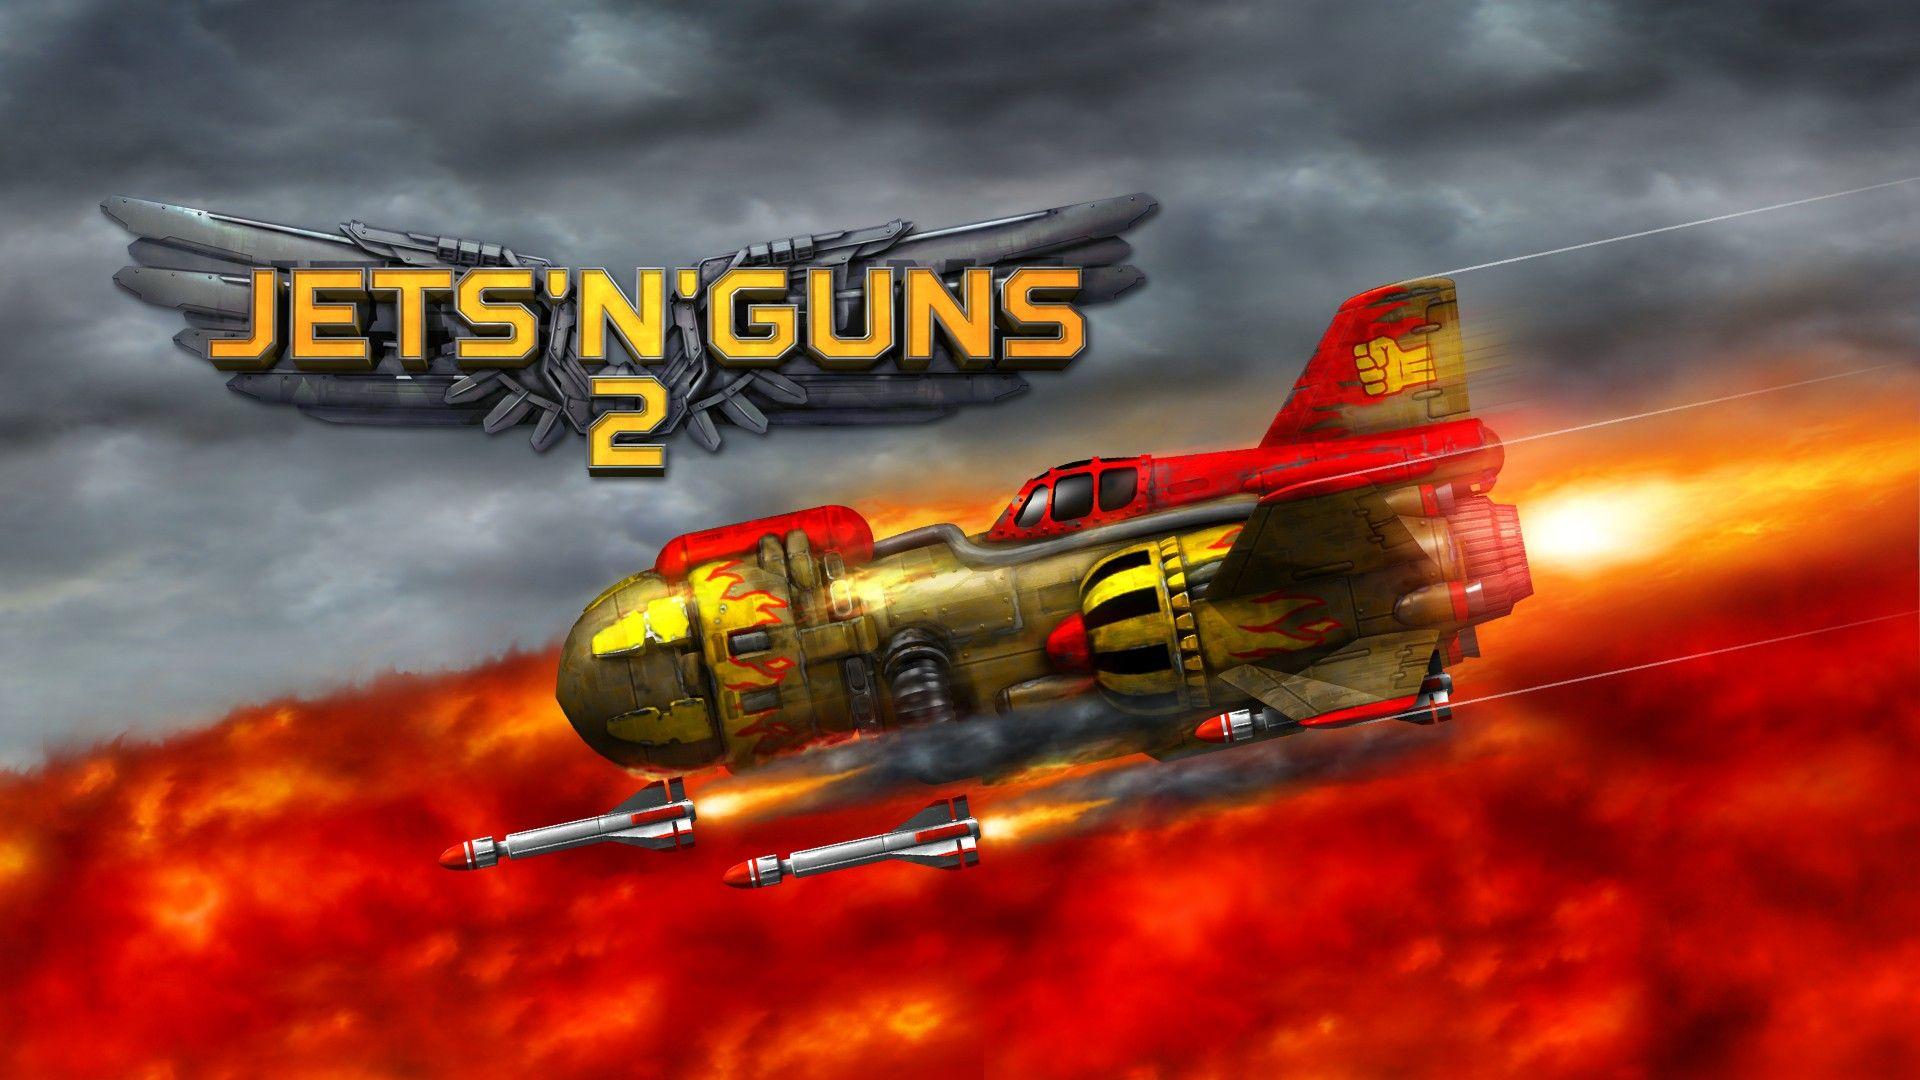 Jets'n'Guns 2 v1.0 NSP XCI For Nintendo Switch